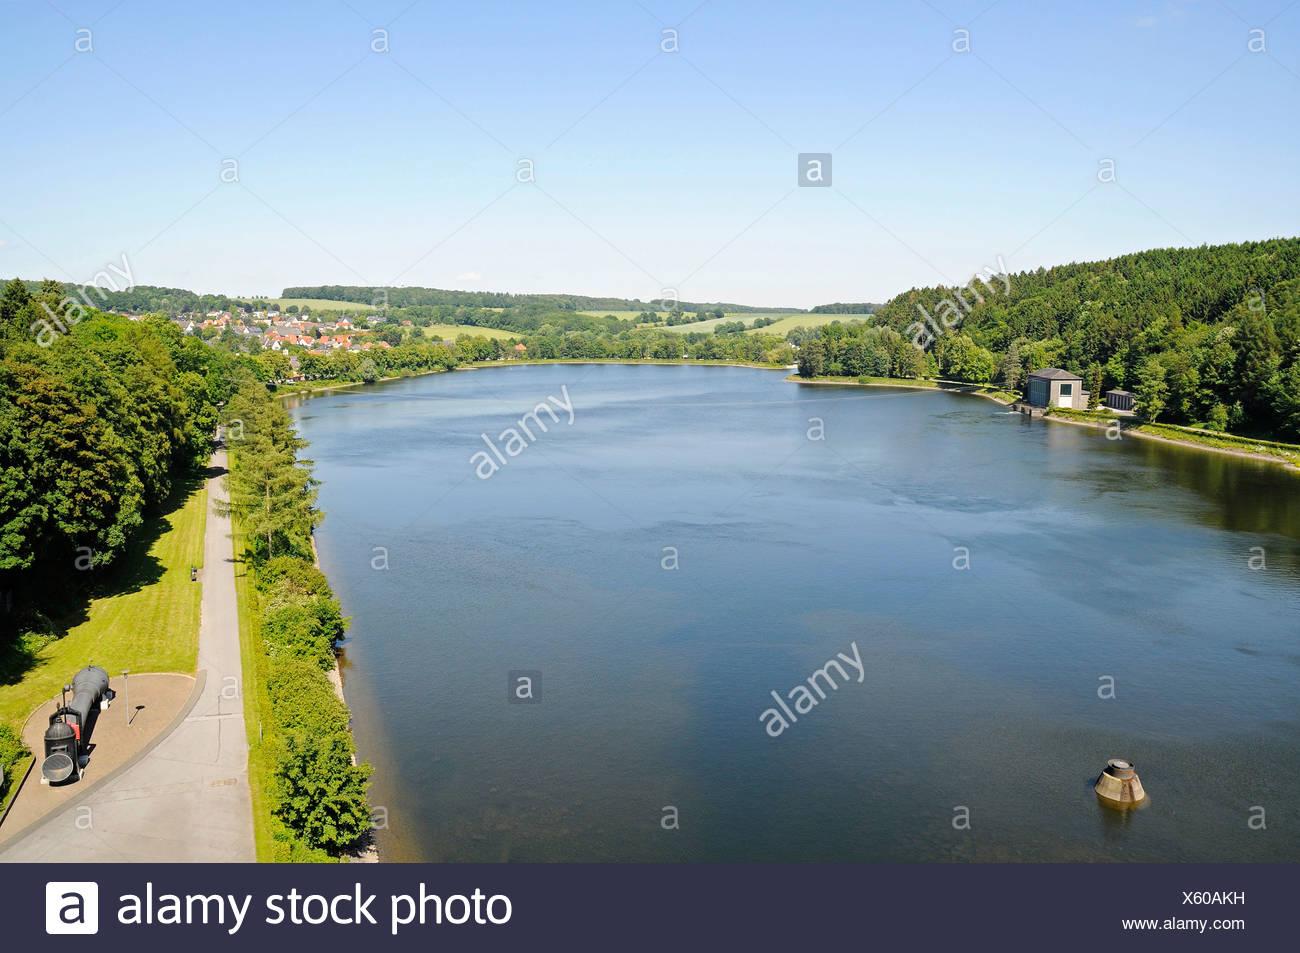 View from the dam, Brueningsen, Moehnesee lake, Moehne, reservoir, dam, North Rhine-Westphalia, Germany, Europe Stock Photo